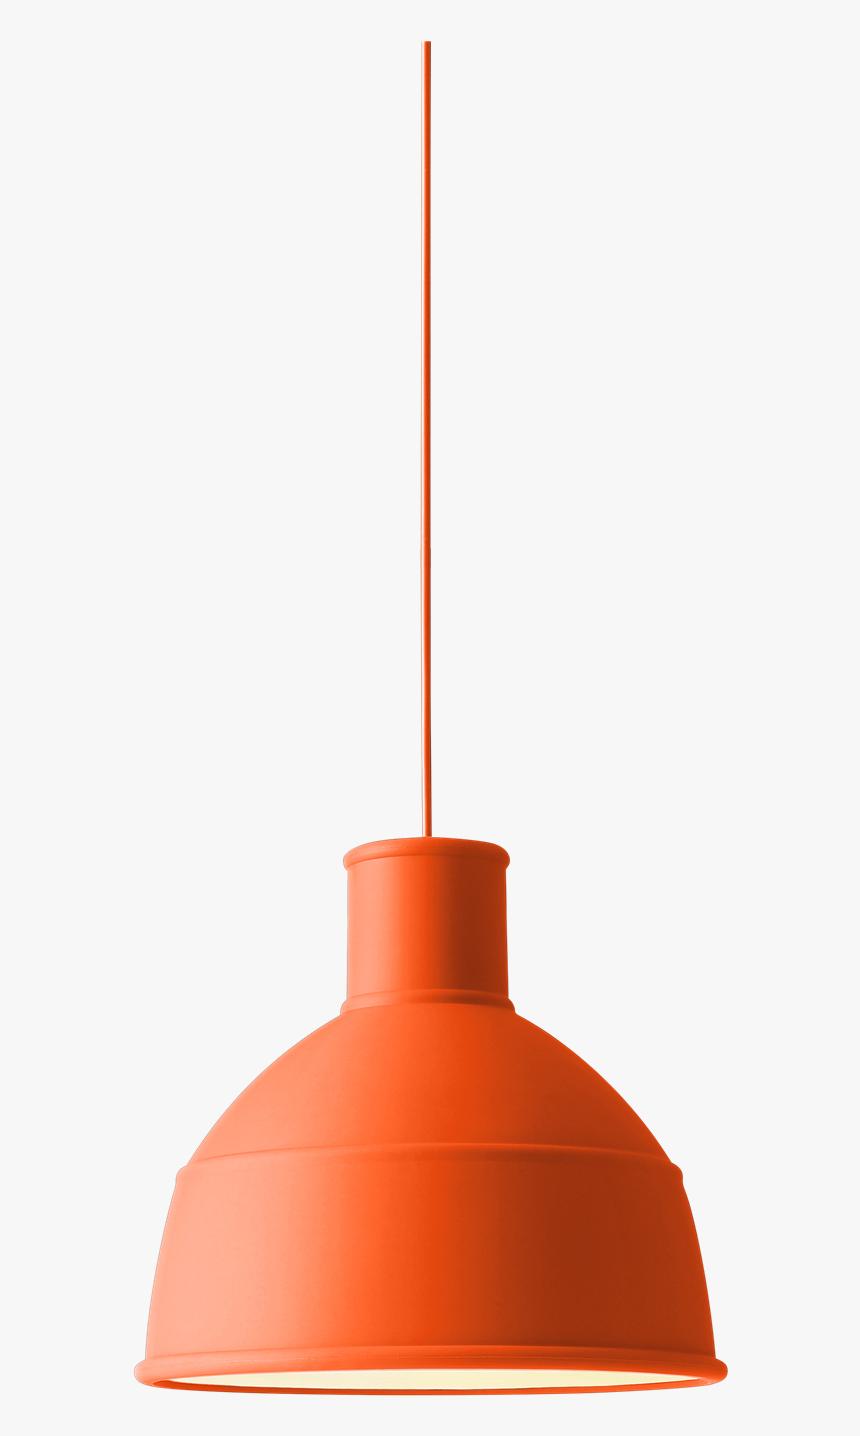 09008 Unfold Orange 1502457153, HD Png Download, Free Download